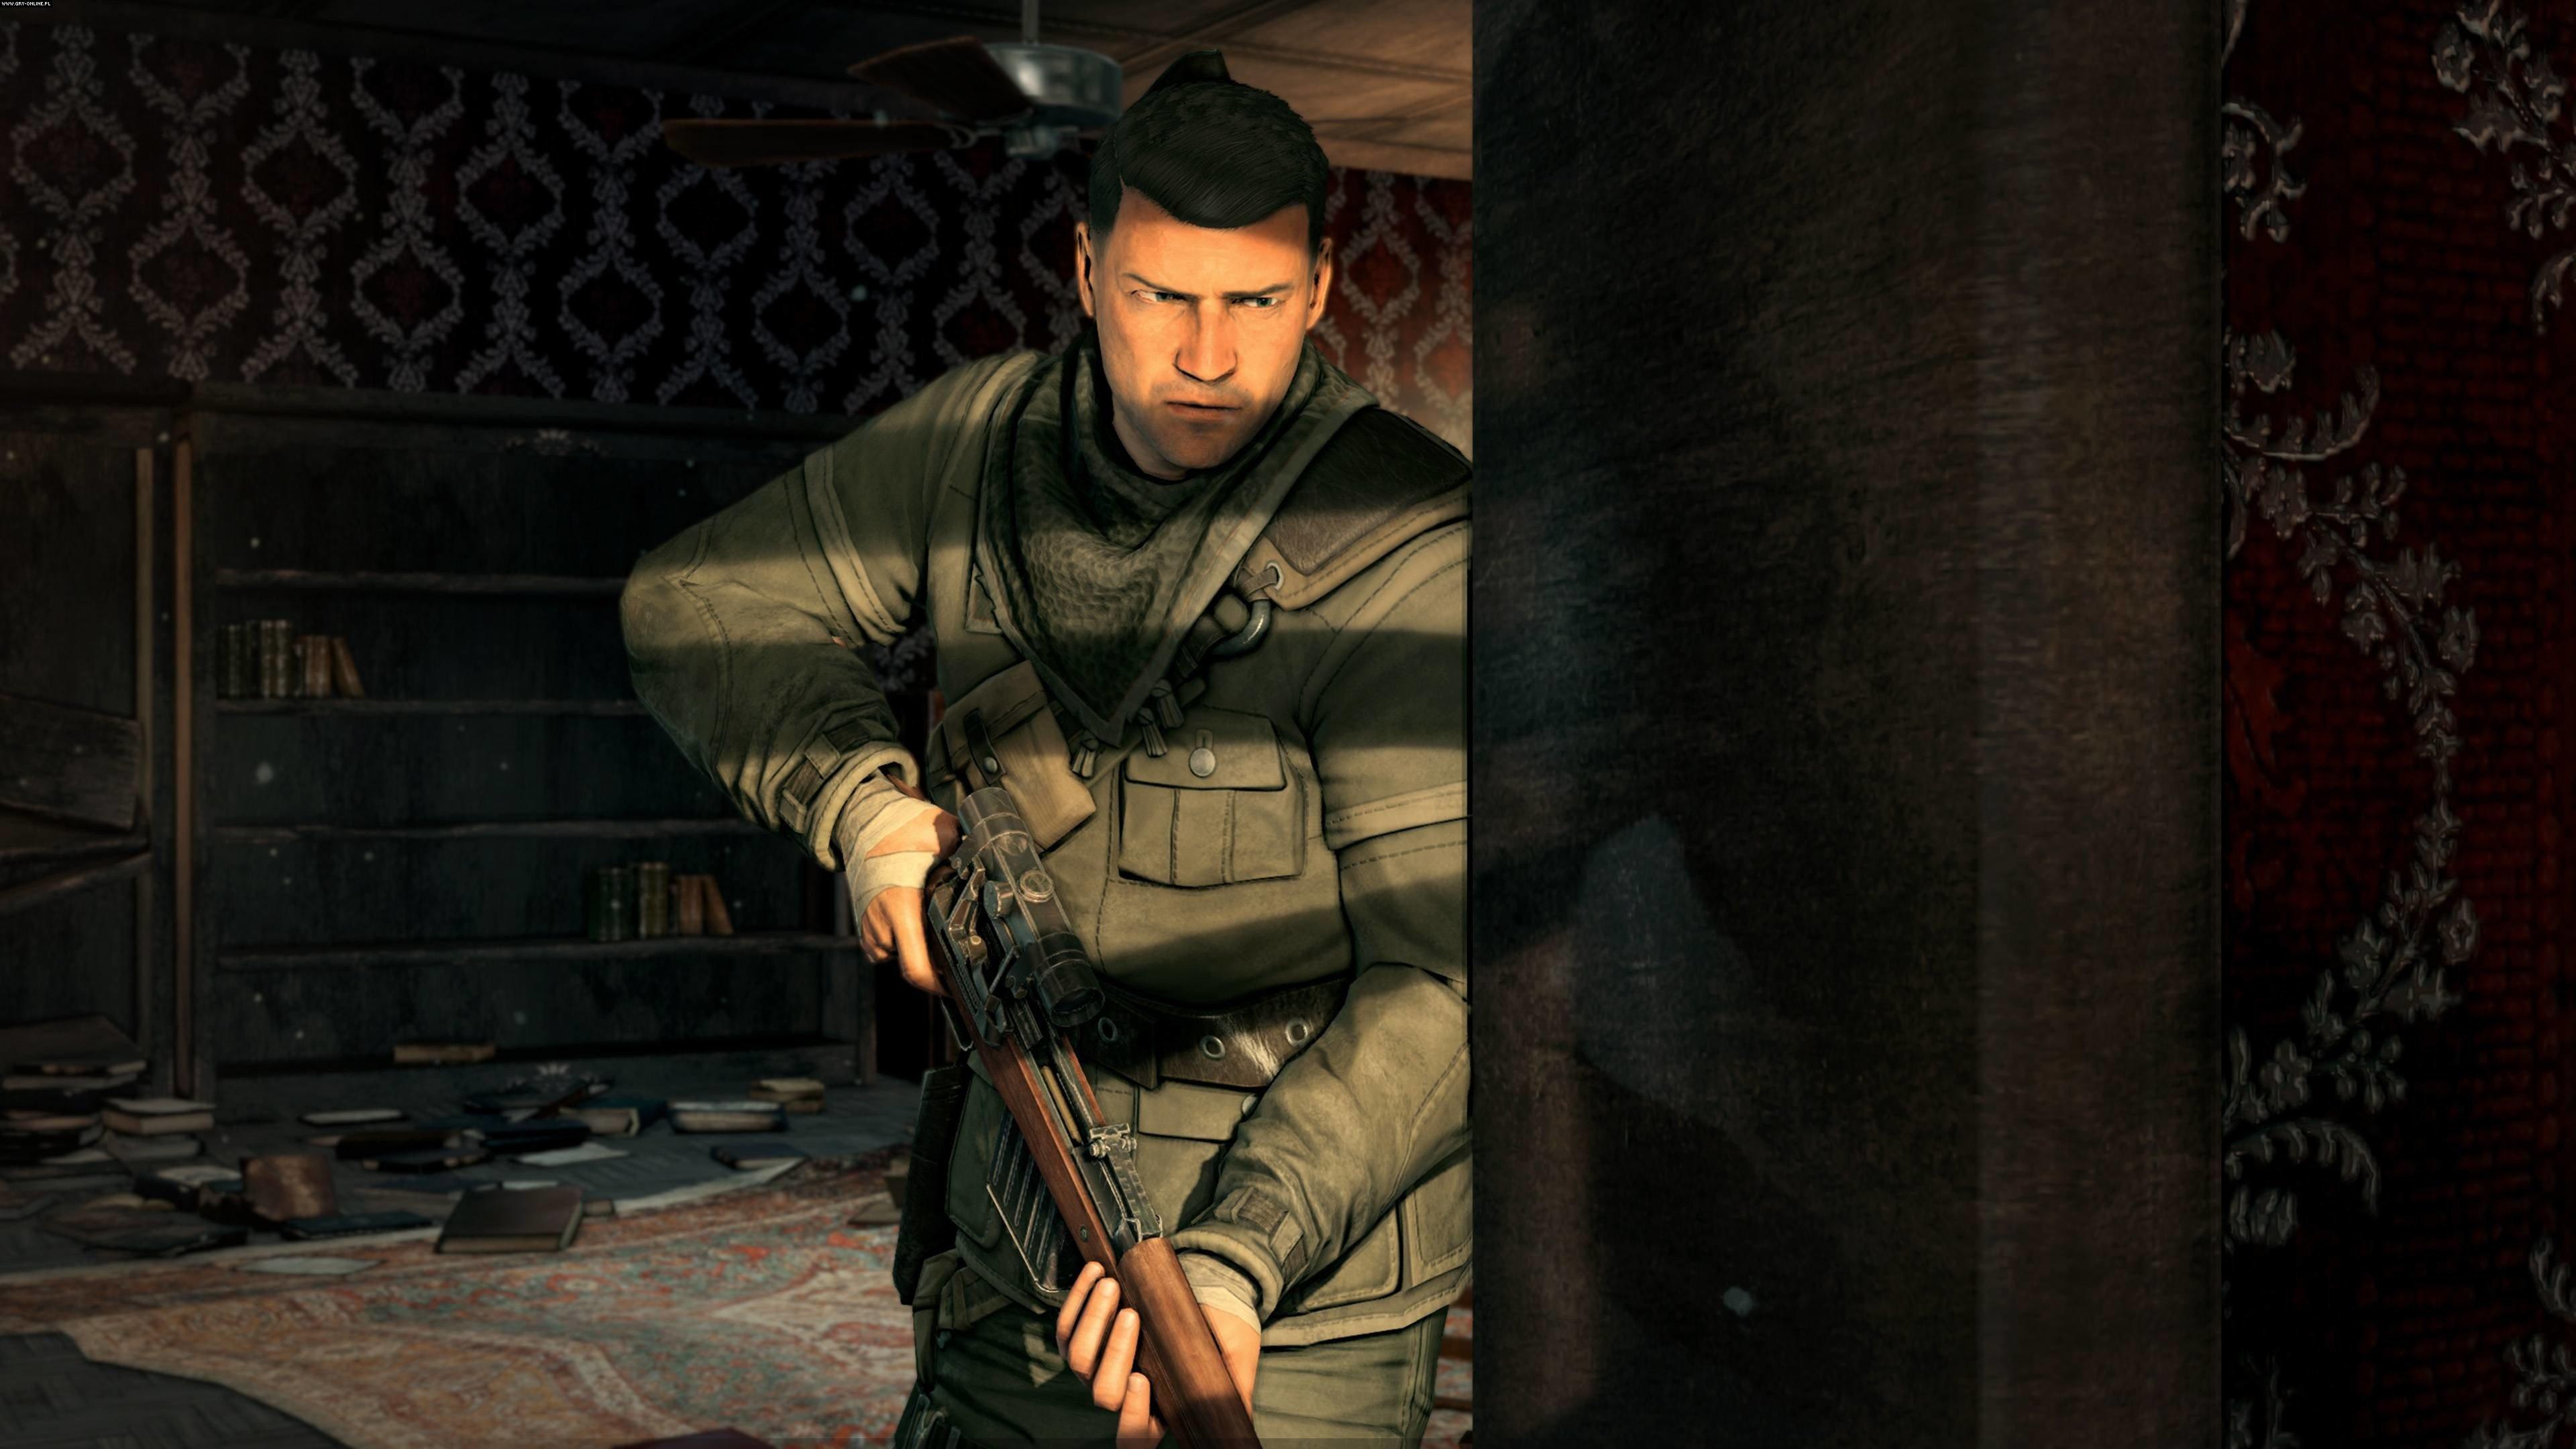 Sniper Elite V2 Remastered PC, PS4, XONE, Switch Games Image 5/8, Rebellion